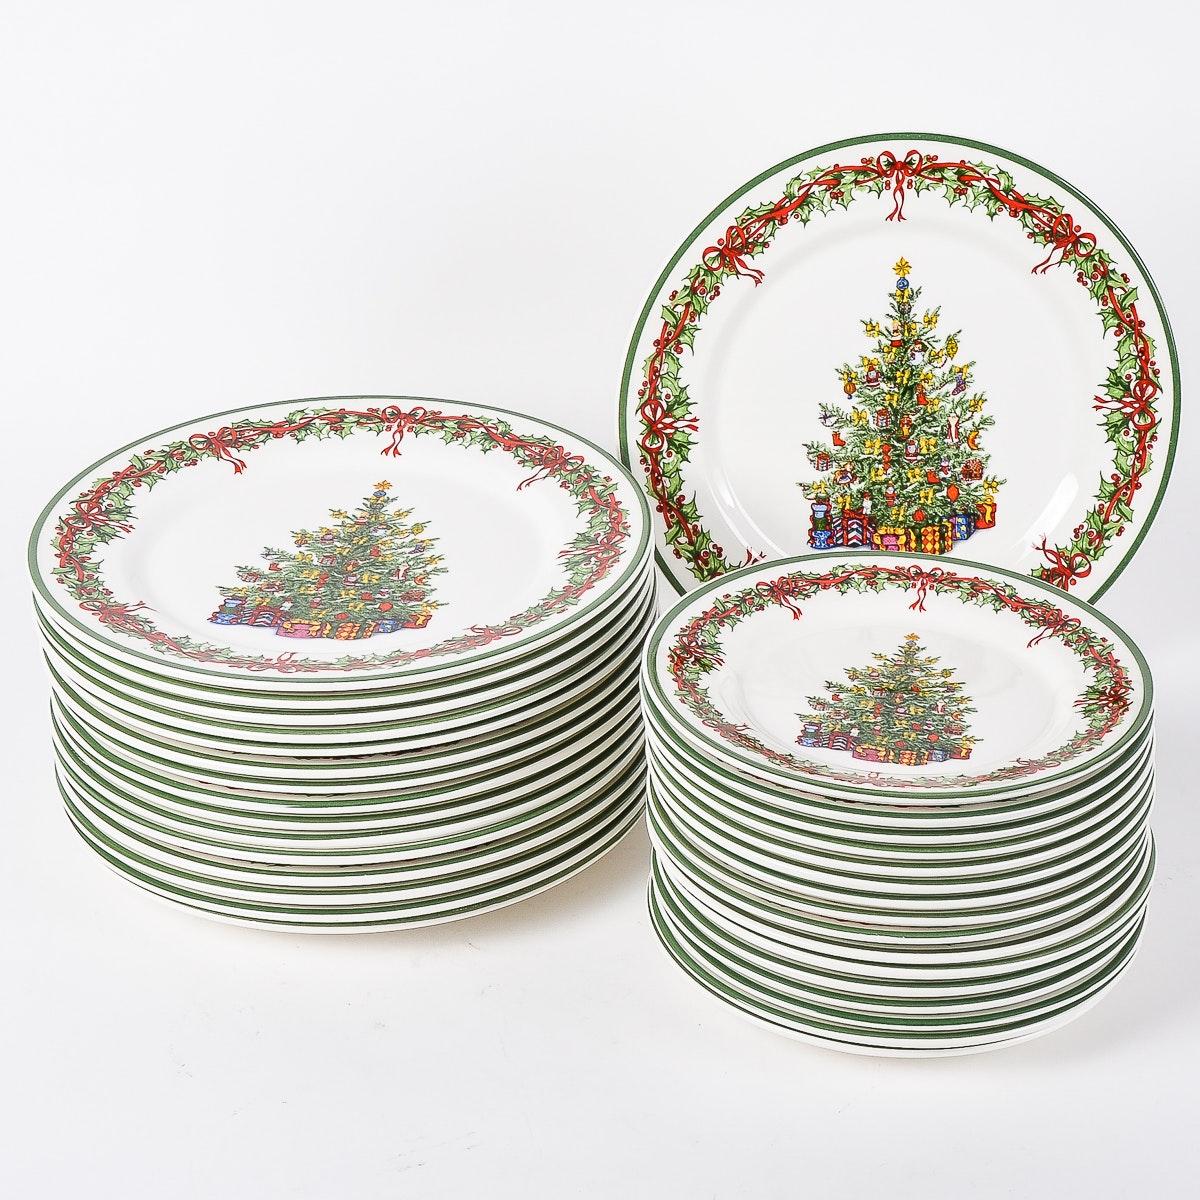 Christopher Radko Christmas Plates ...  sc 1 st  EBTH.com & Christopher Radko Christmas Plates : EBTH